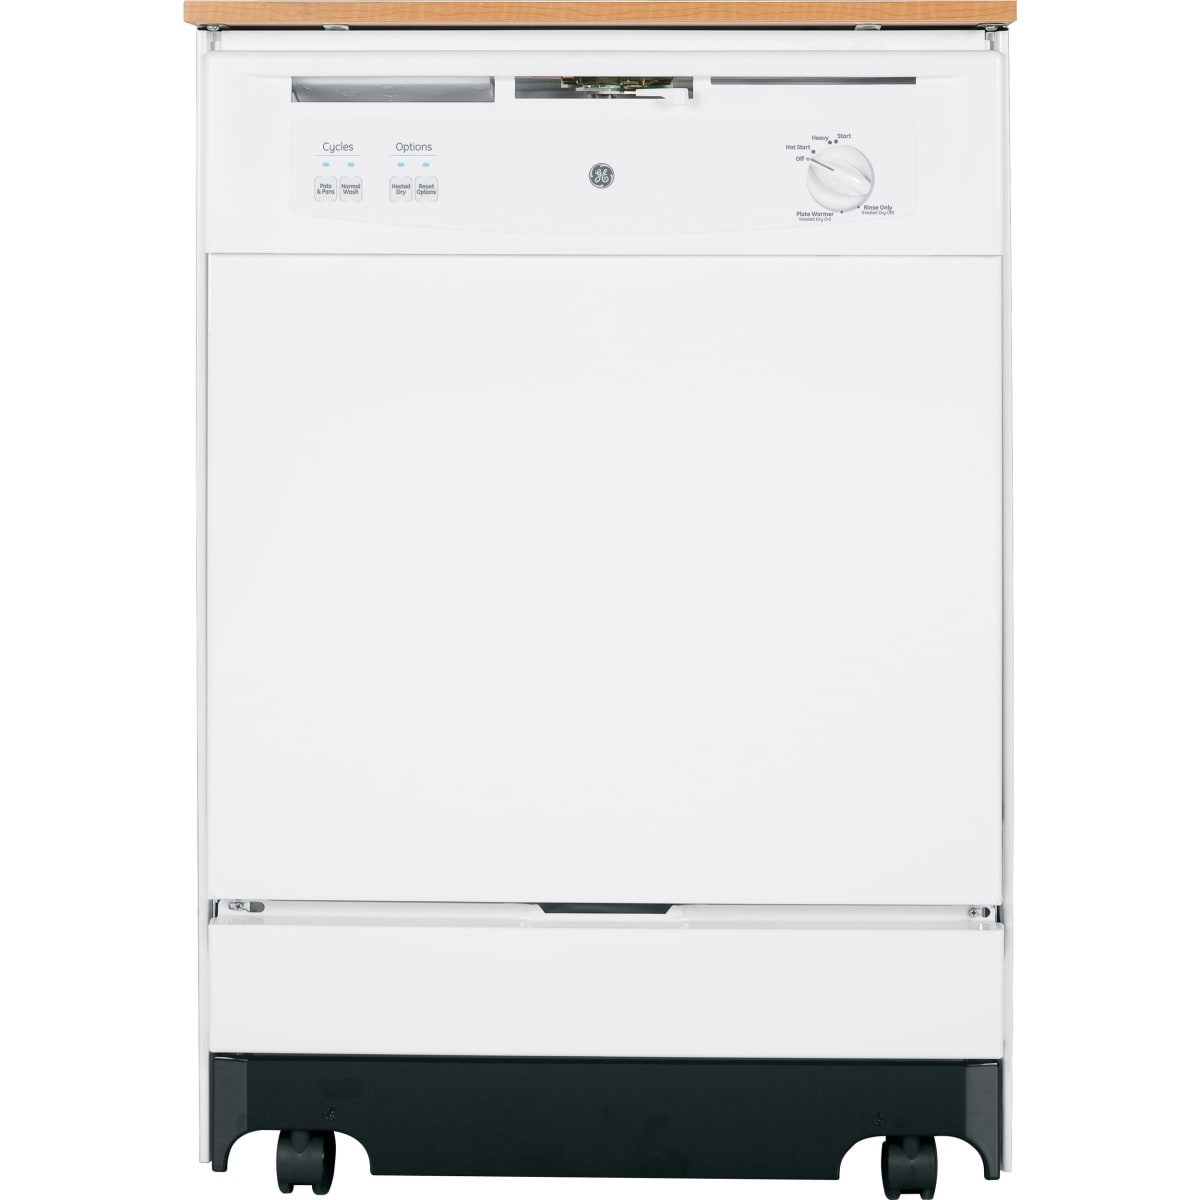 GE Portable Energy Star Dishwasher